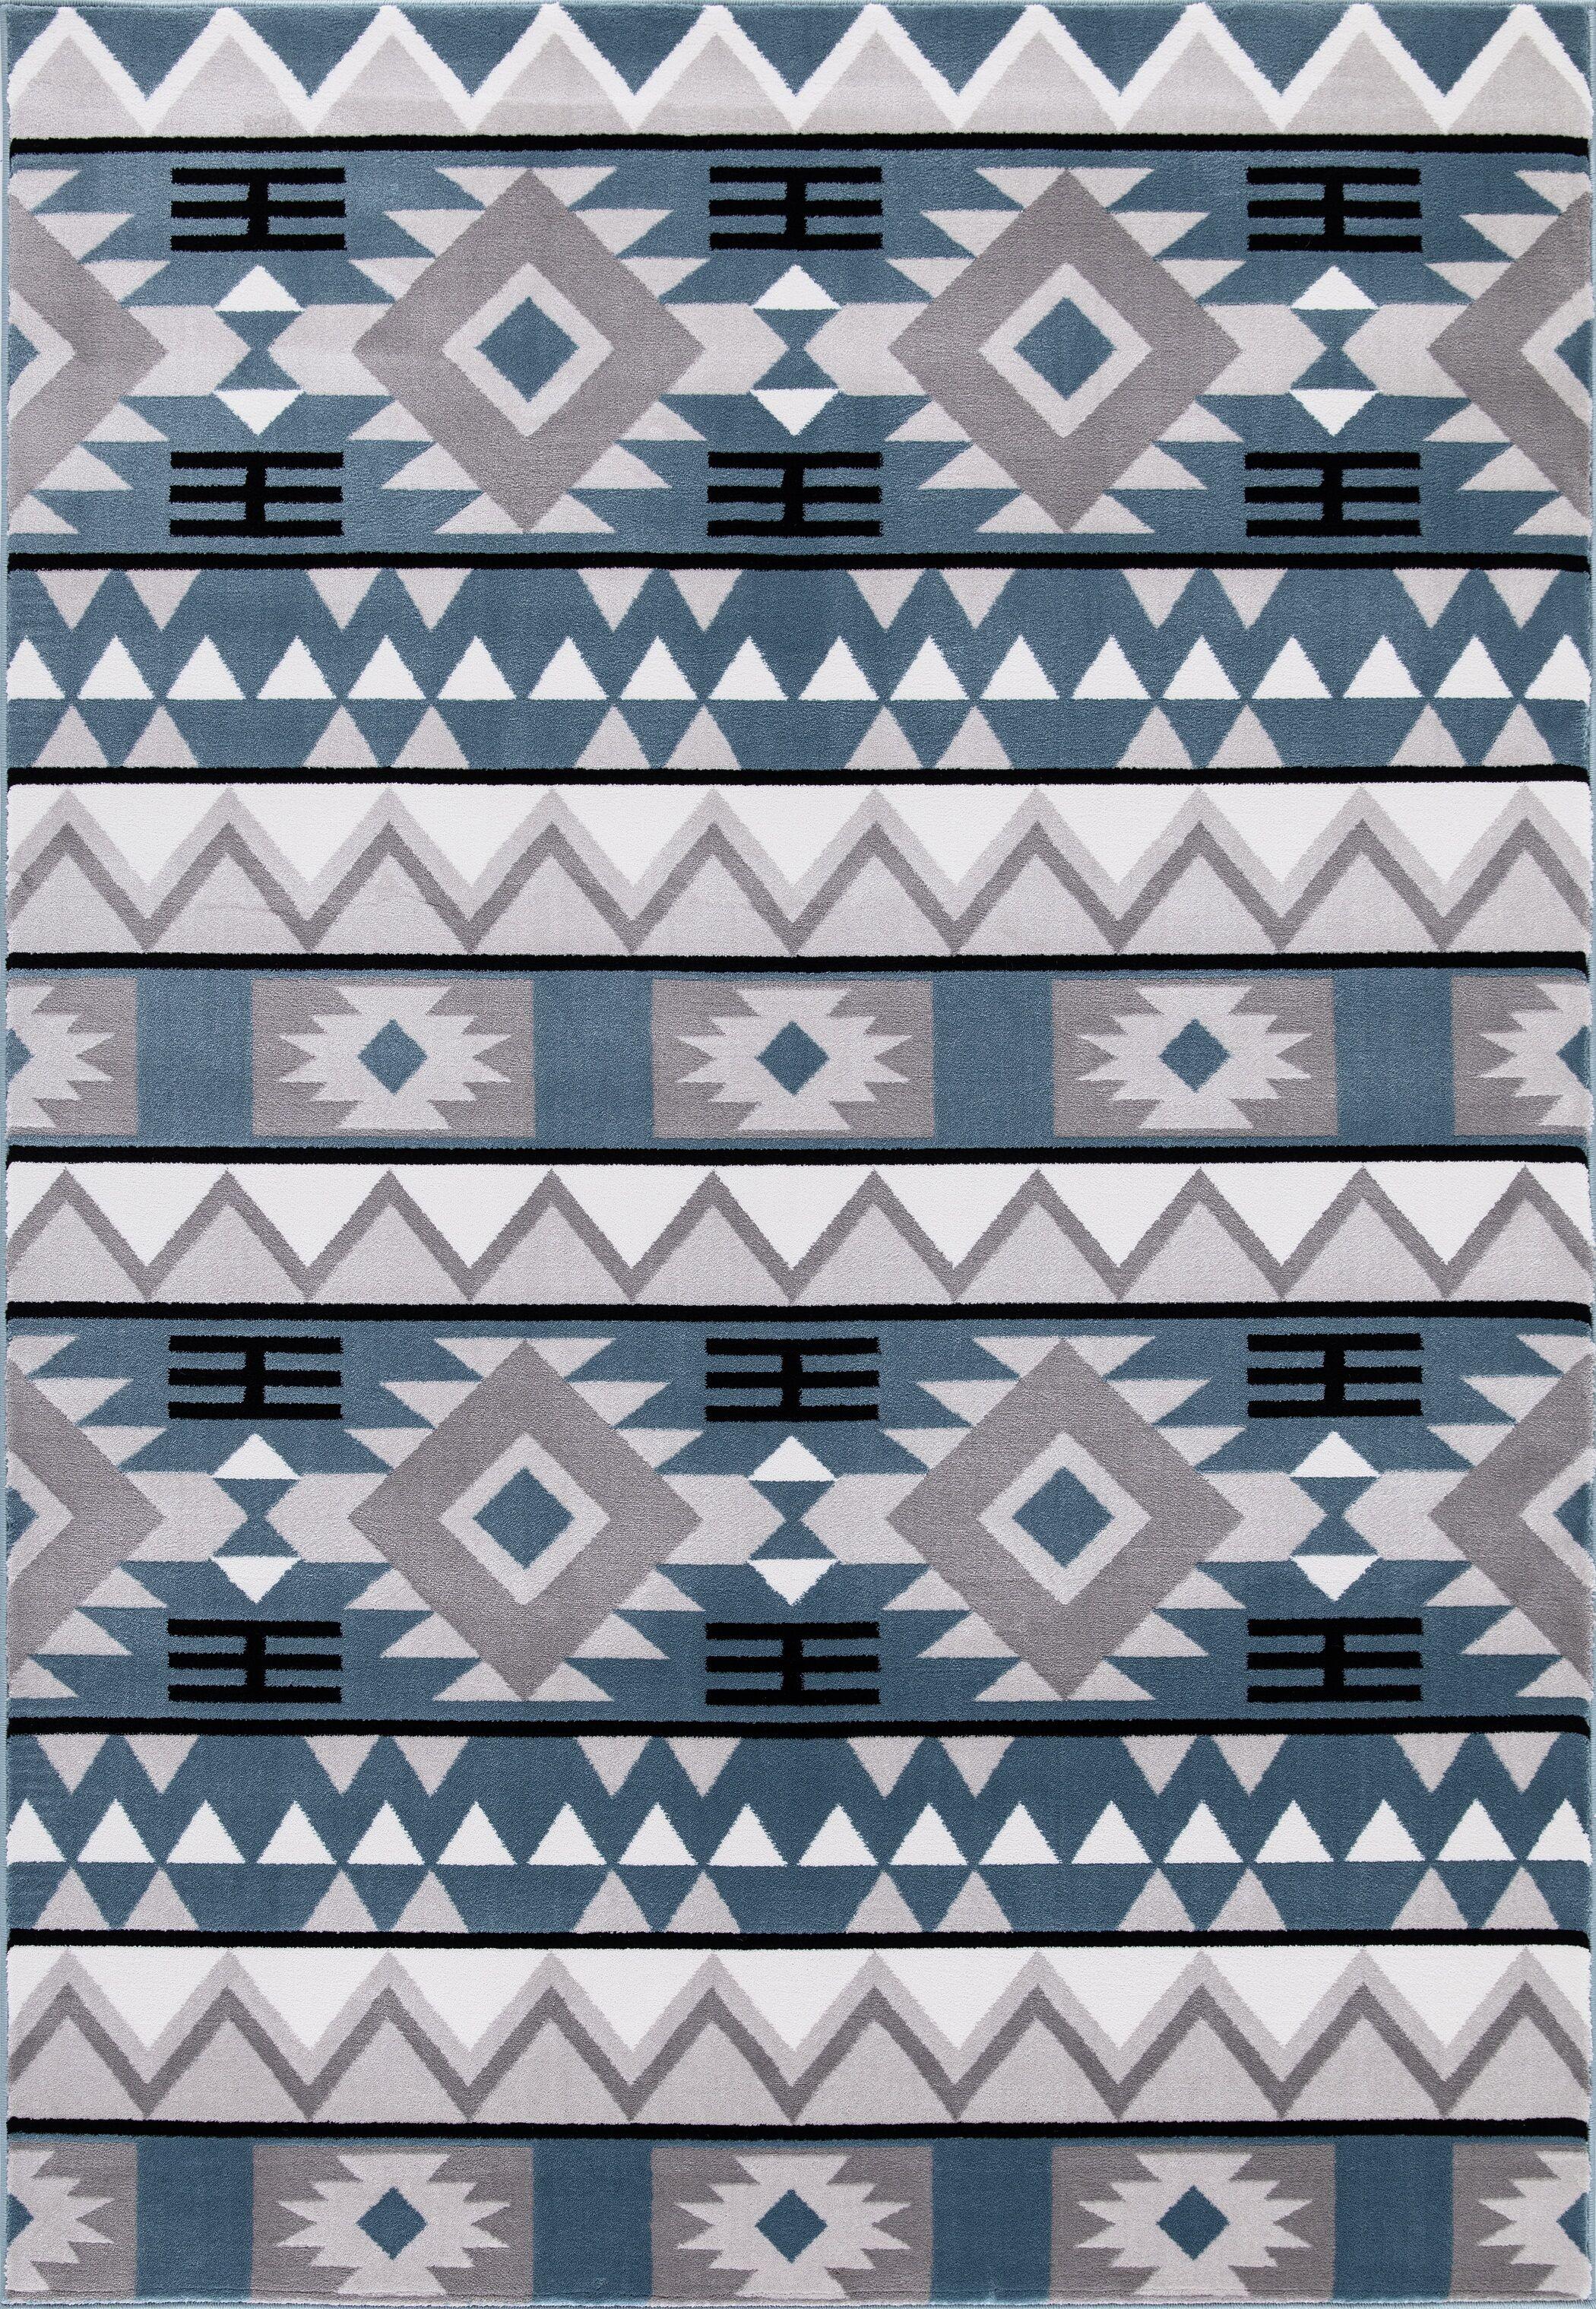 Paugh Premium Southwestern Natïve Blue/Gray Area Rug Rug Size: Rectangle 6'7